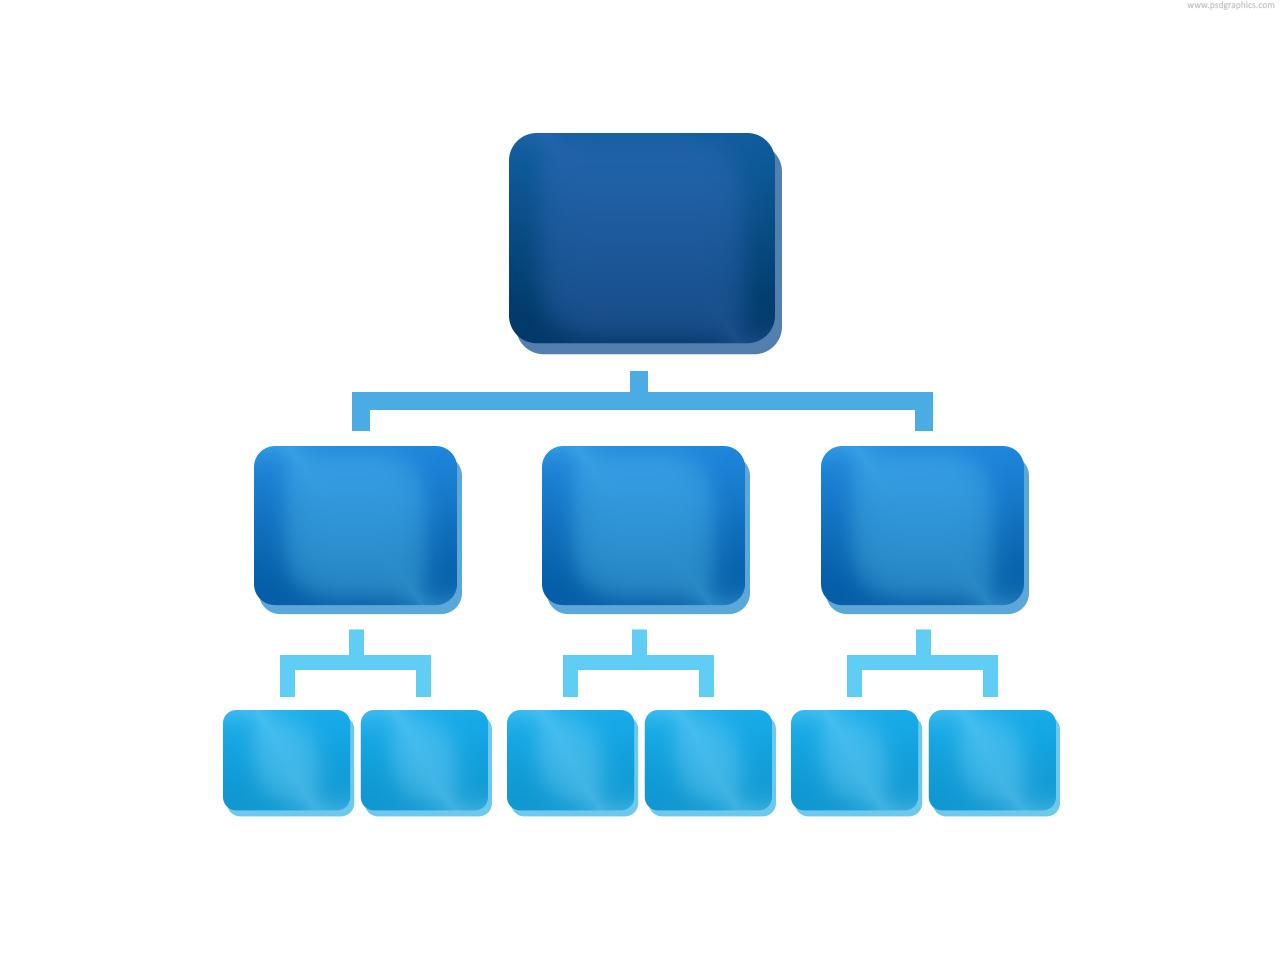 https://i1.wp.com/www.psdgraphics.com/file/organization-chart.jpg